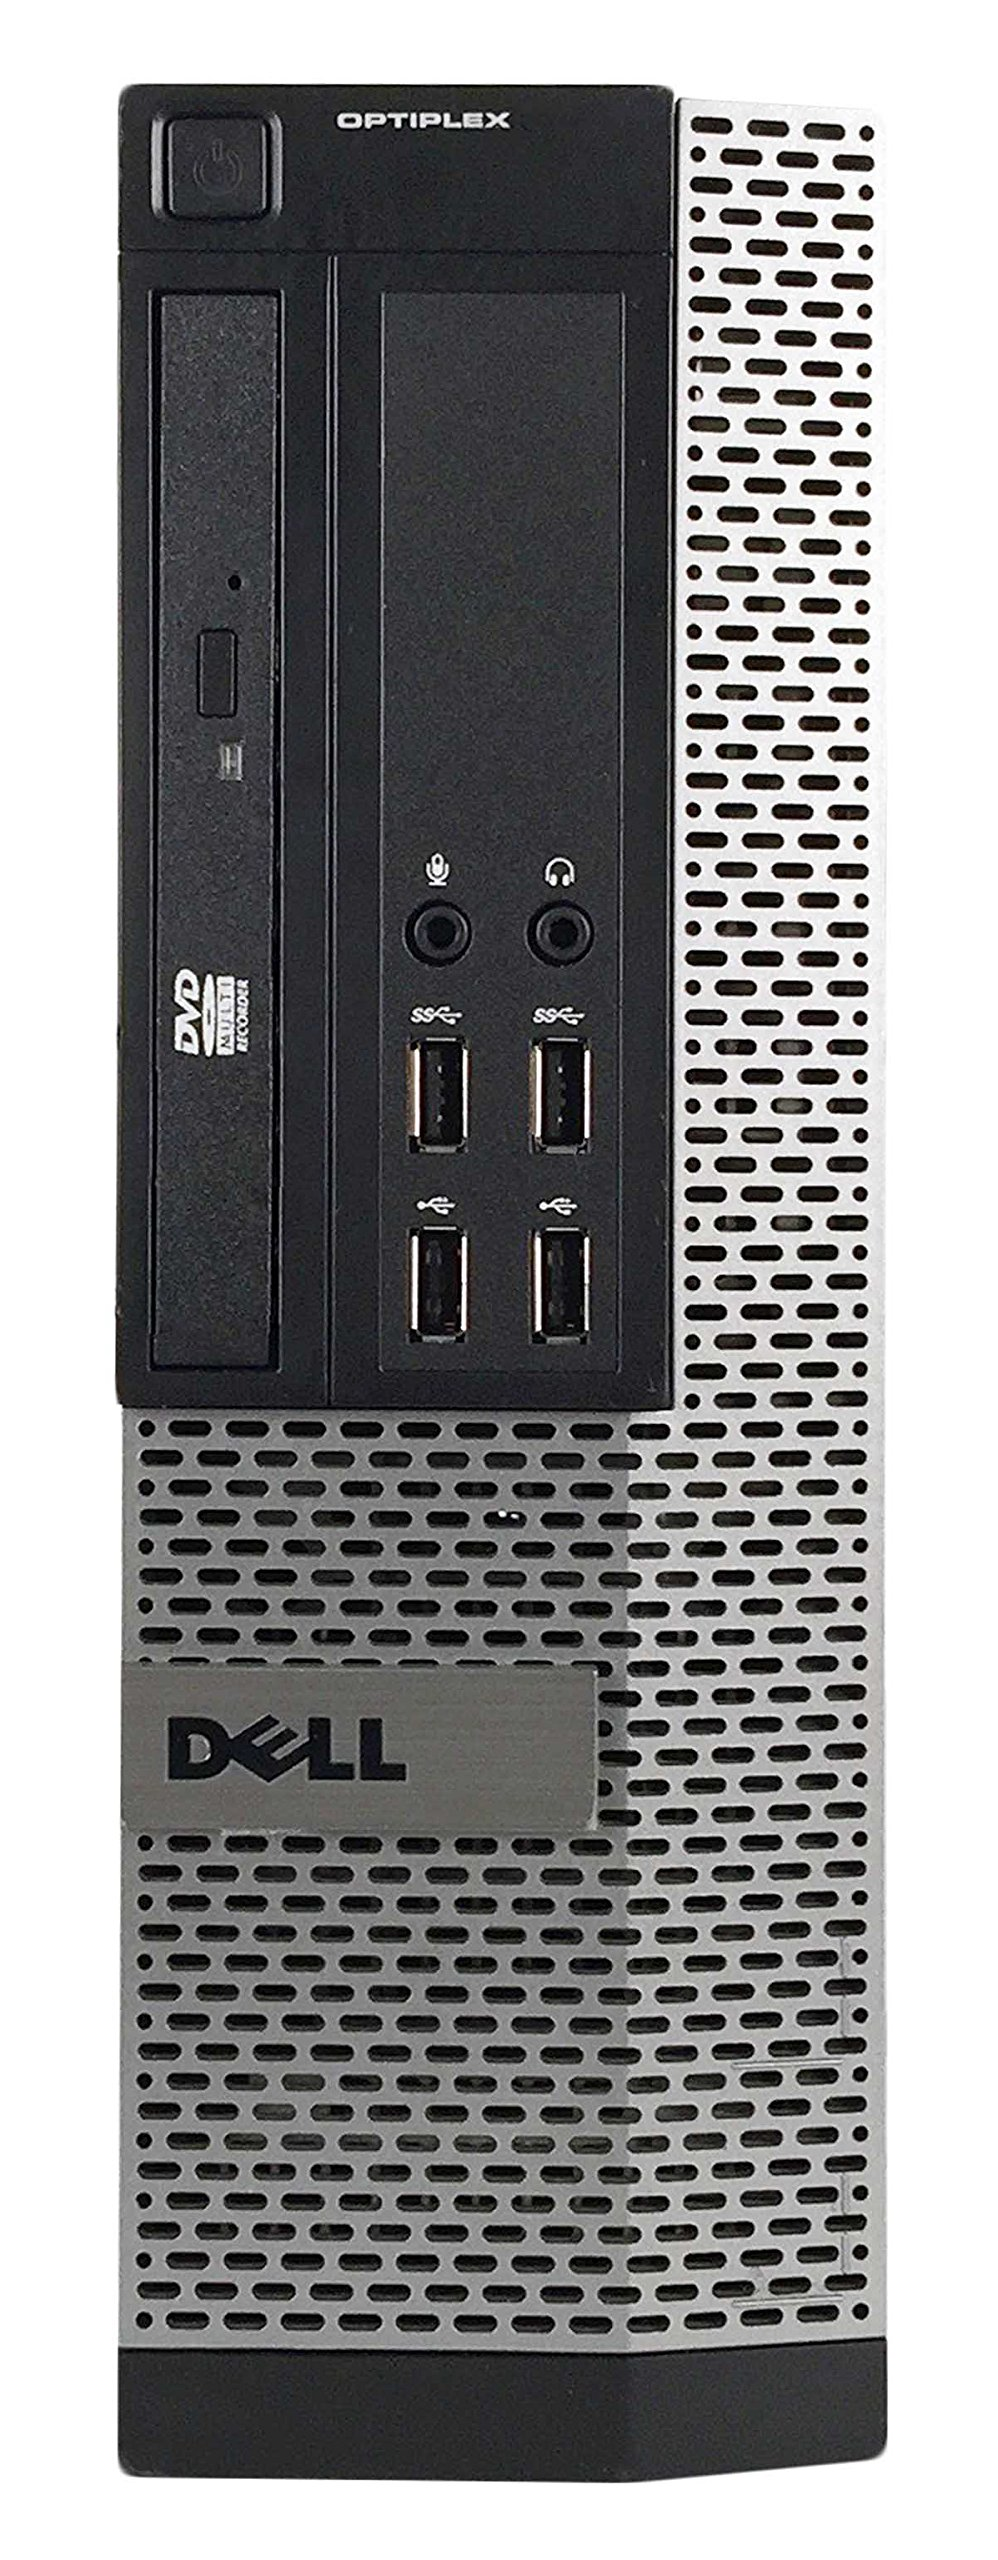 Dell OptiPlex 990 Small Form Business High Performance Desktop - PC CI5 2400 3.1G,16G DDR3,2TB,DVD,Windows 10 Pro - Black/Silver - 16VFDEDT1156